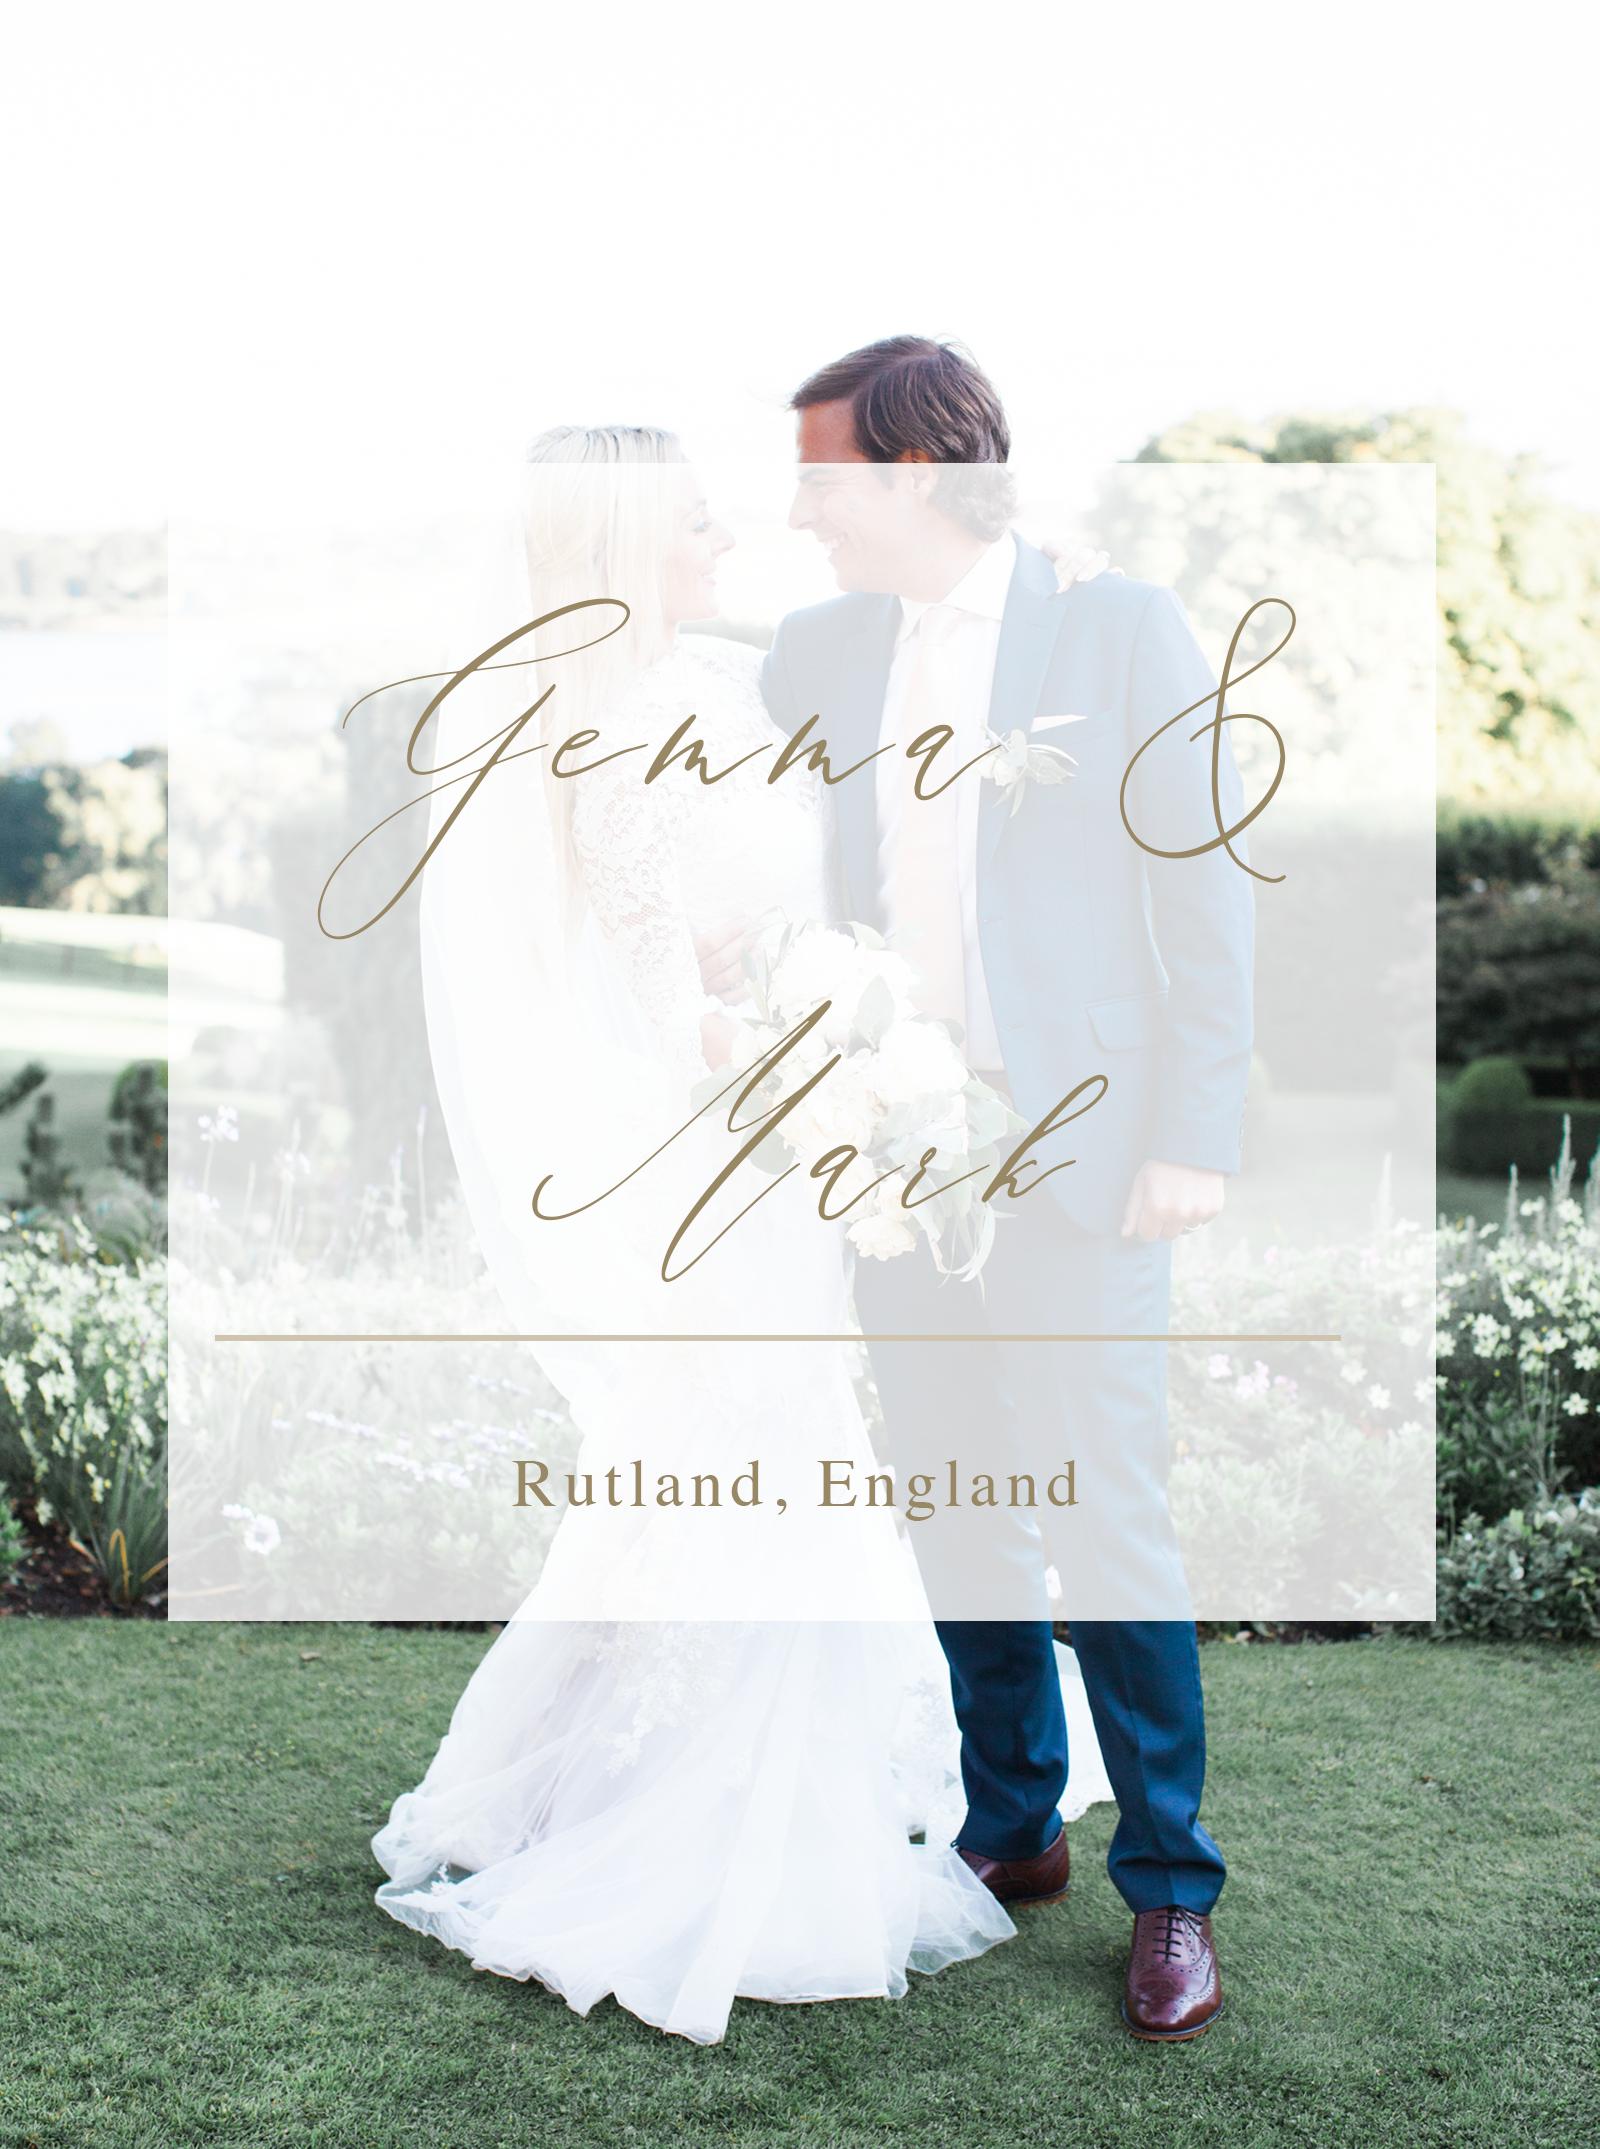 Lily+&+Sage+_+Luxury+Wedding+Planner+UK+_+White+and+Green+Wedding+English+Summer+Wedding+Rutland+Wedding+English+Countryside+Wedding+_+Katie+Julia+Photography-240.png